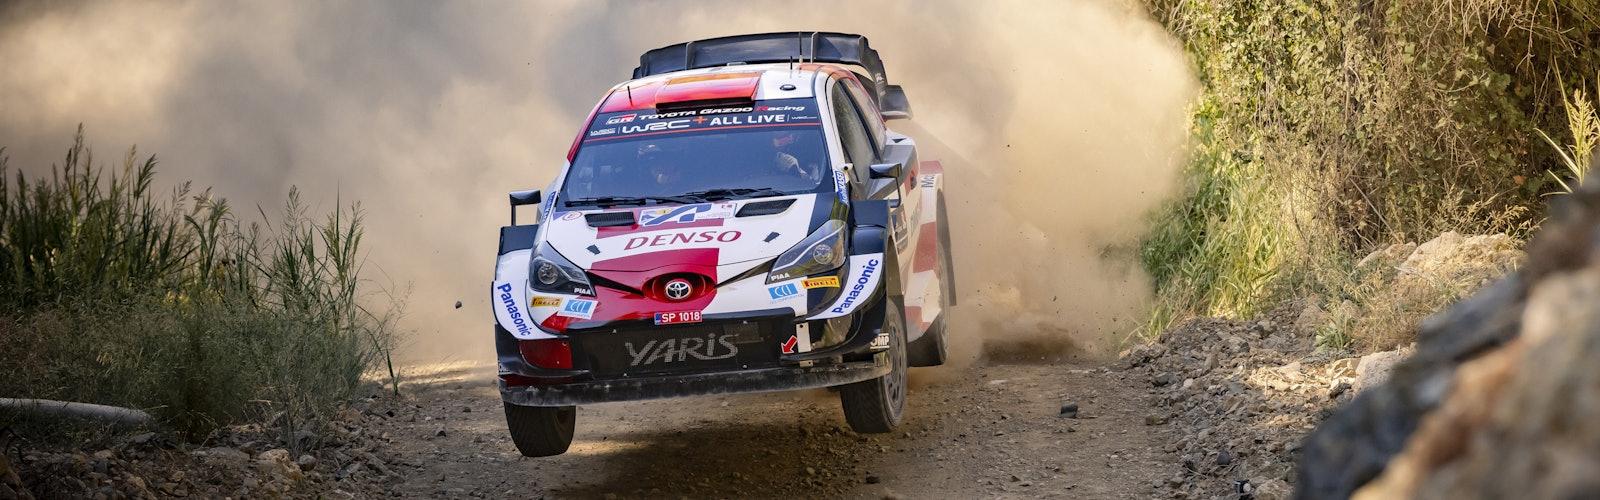 WRC_2021_Rd.9_159